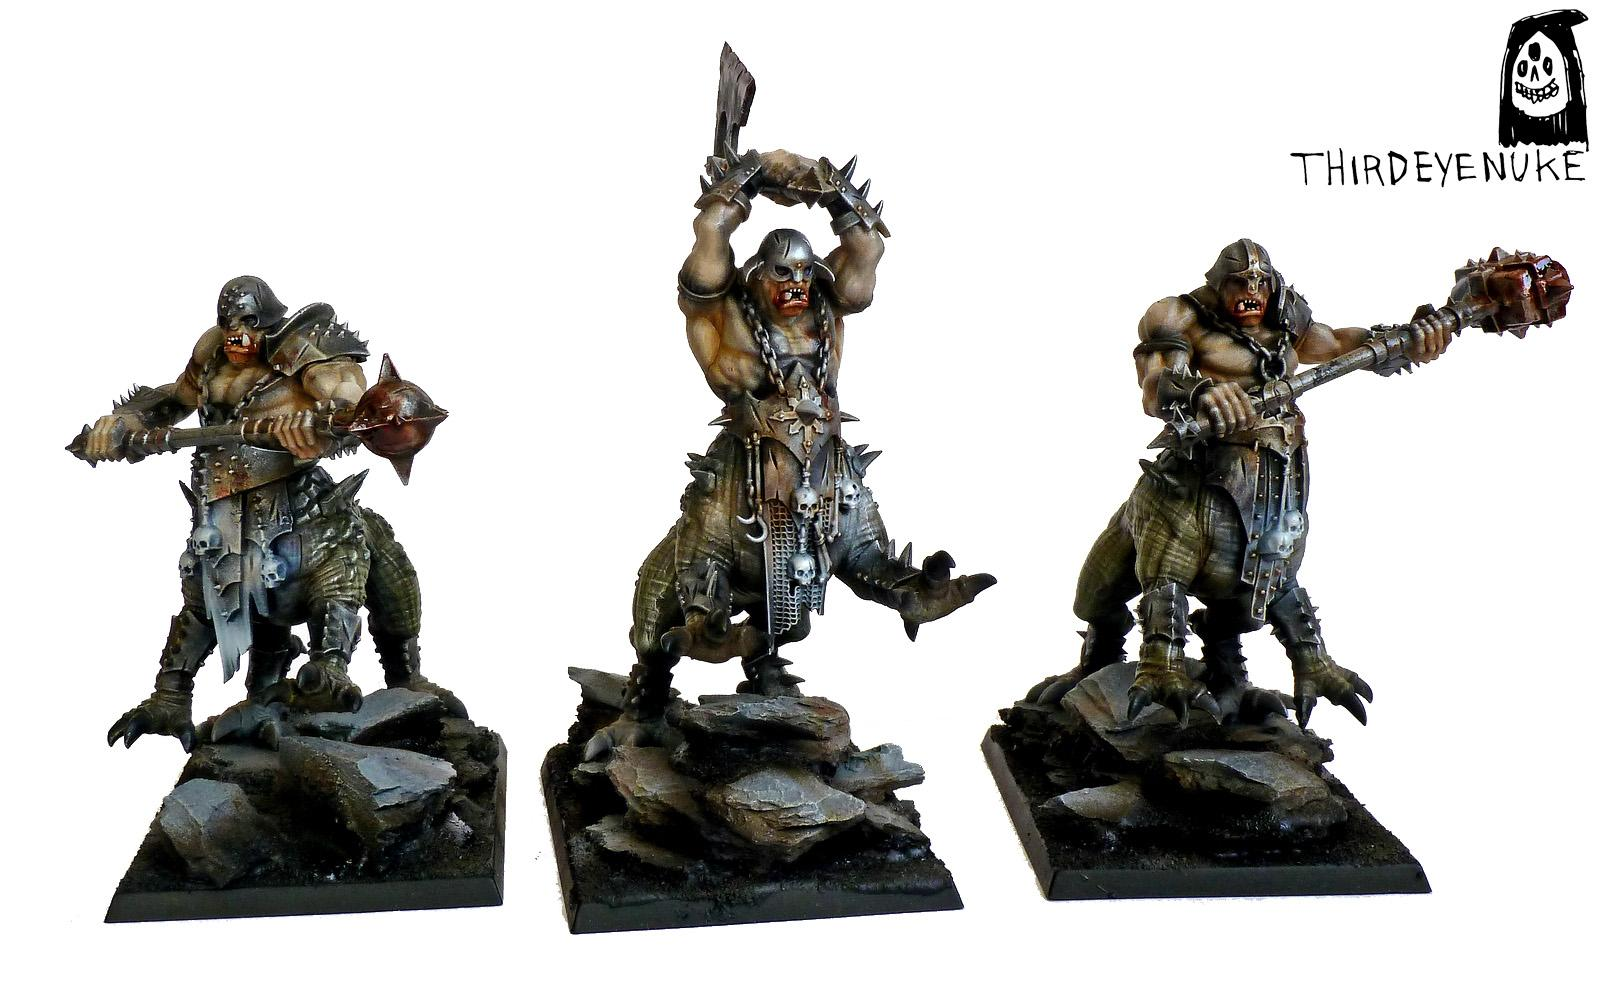 Dragon Ogres, Thirdeyenuke, Warhammer Fantasy, Warriors Of Chaos